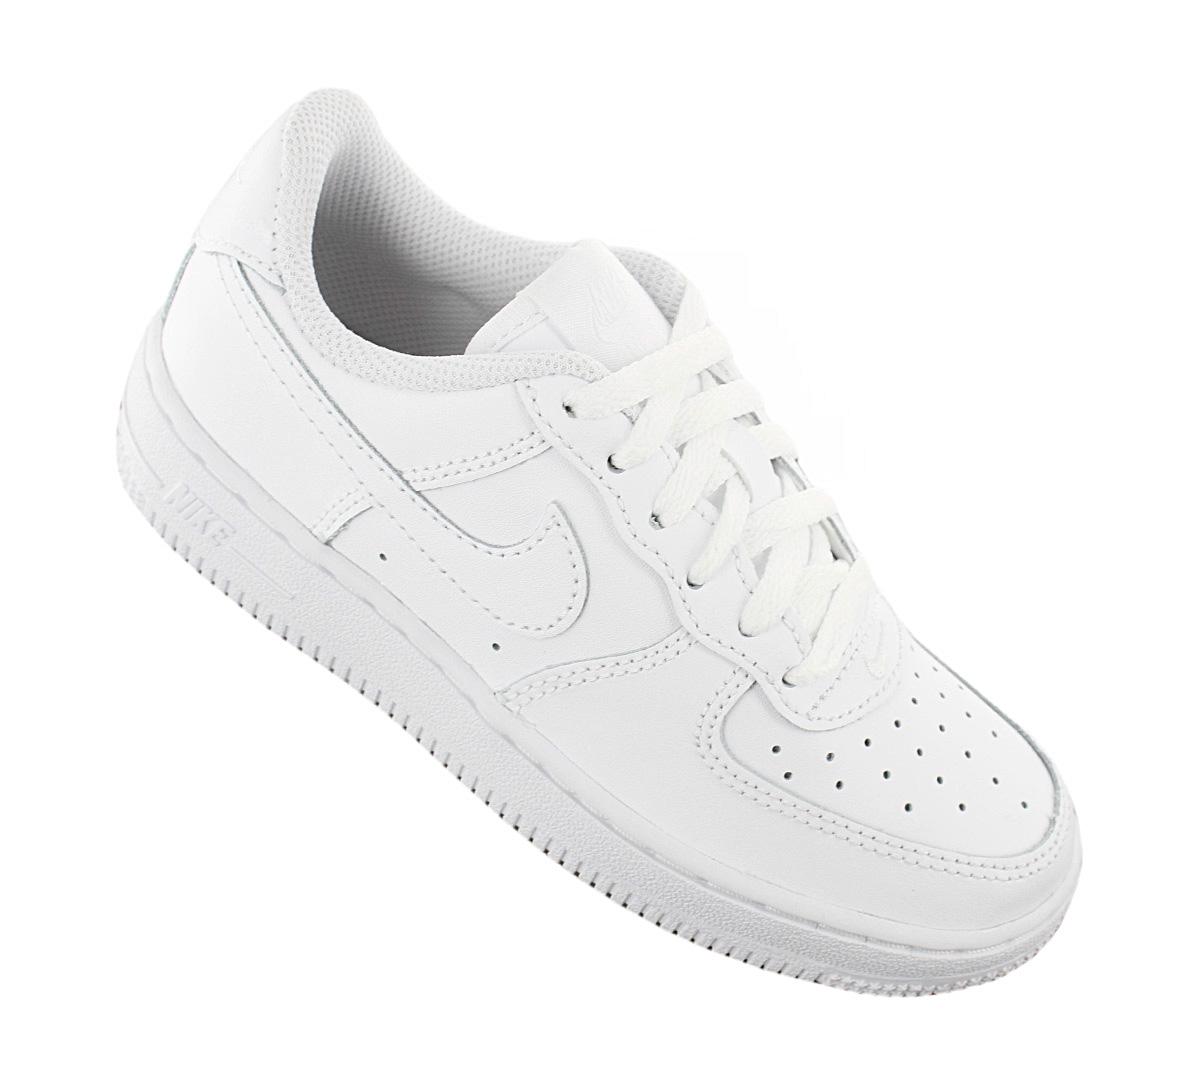 Detalles de Nike Air Force 1 Low Leather Ps Niños Sneaker 314193 117 Piel Blanco Zapatos Neu